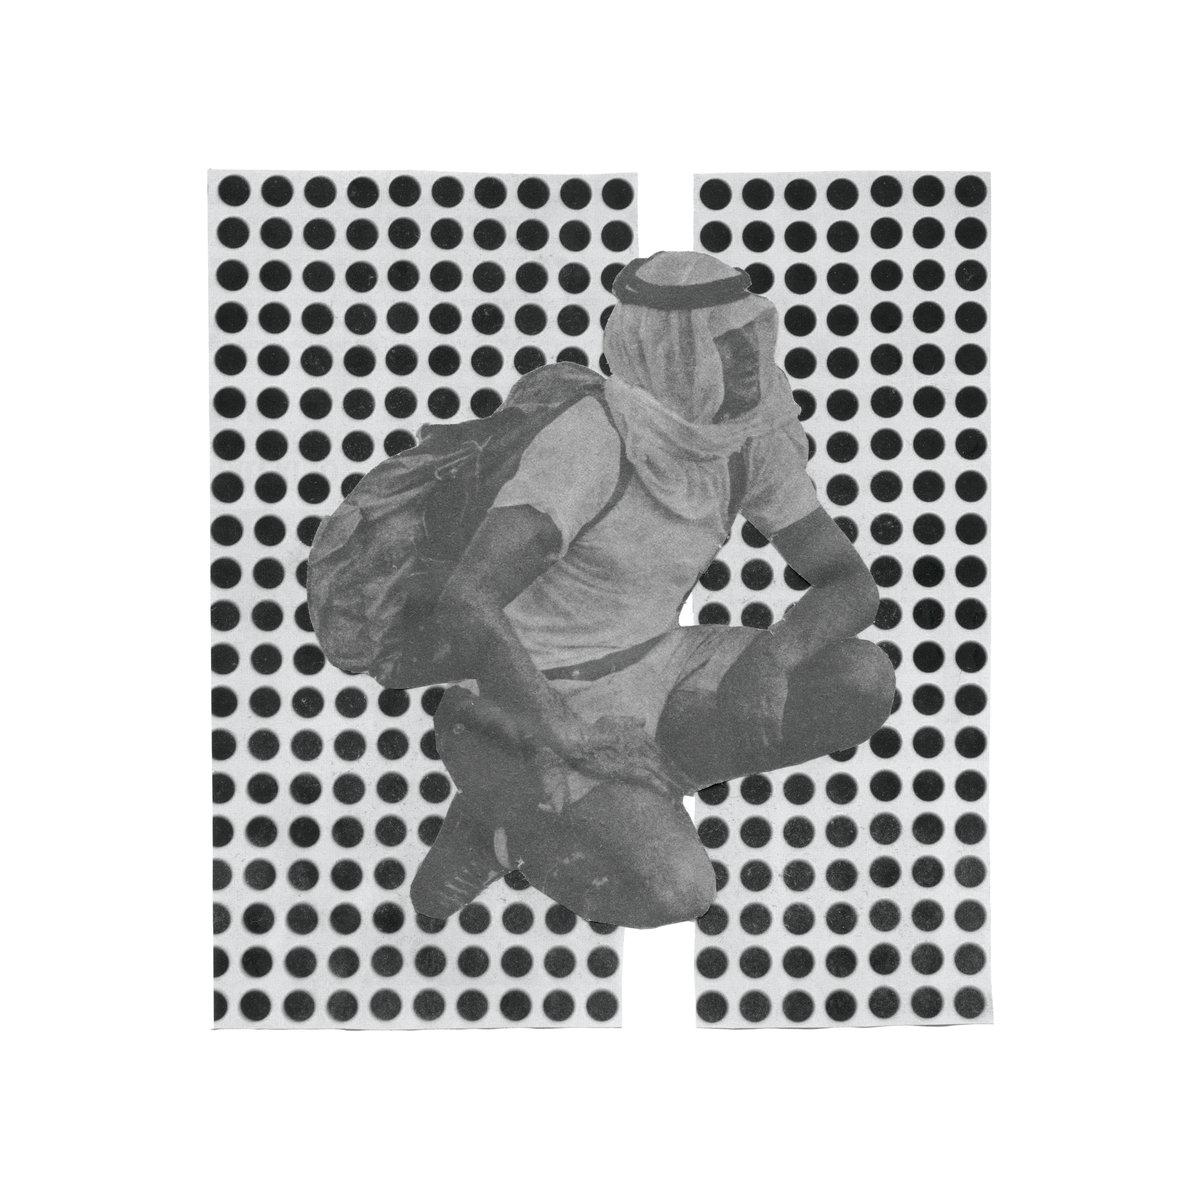 ulrika-spacek-the-album-paranoid.png